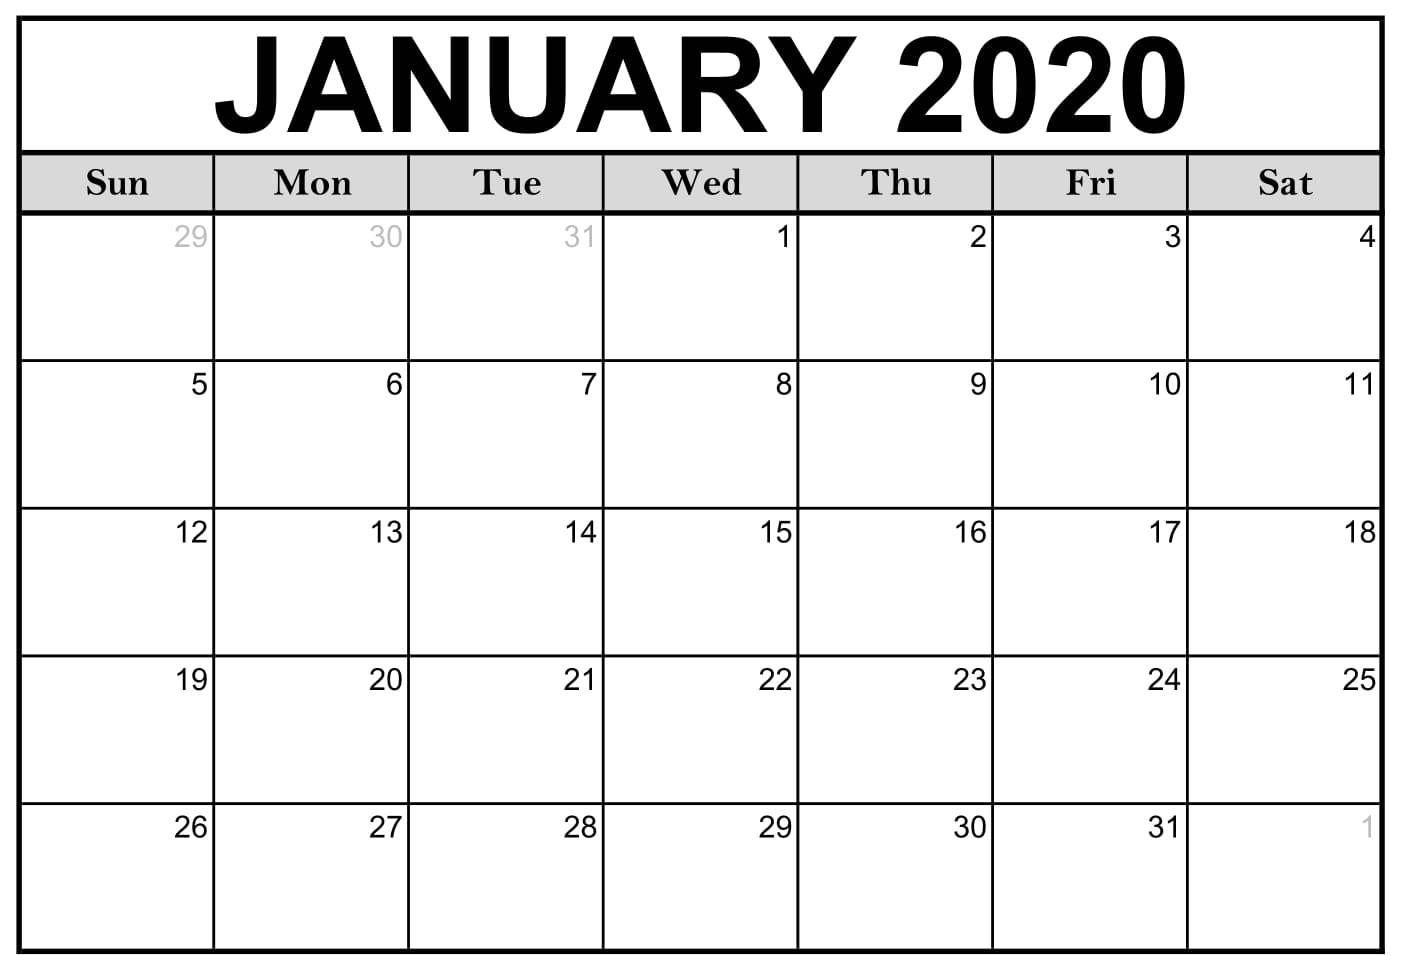 January 2020 Calendar Excel Free